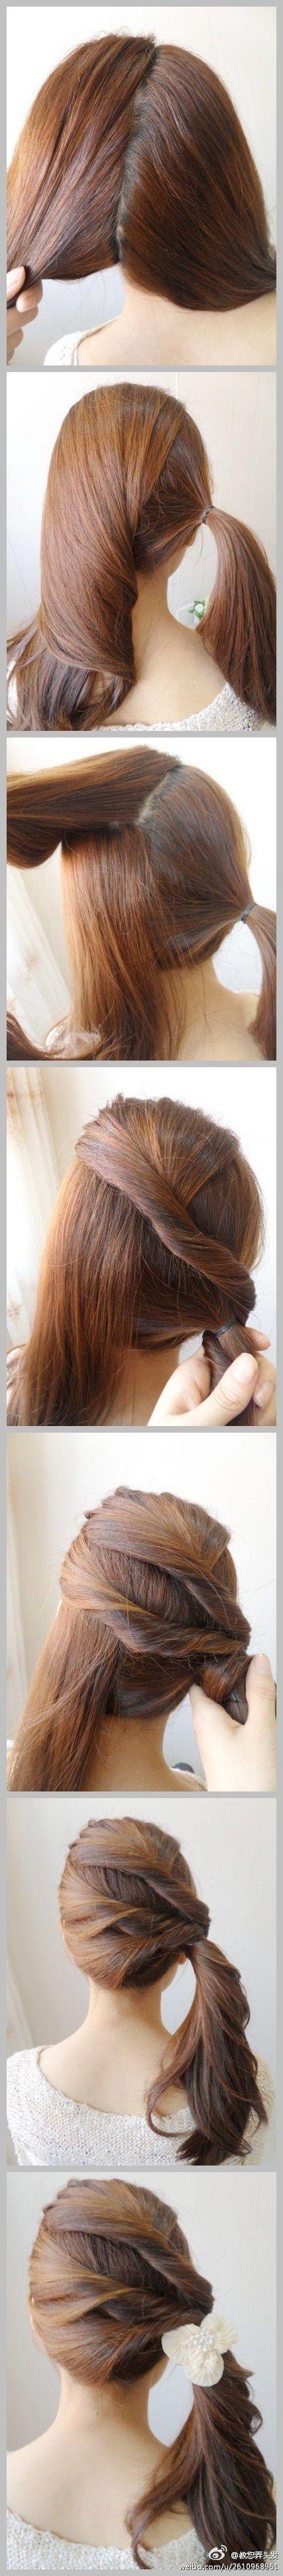 Twisty ponytail style.  SaiFou Image